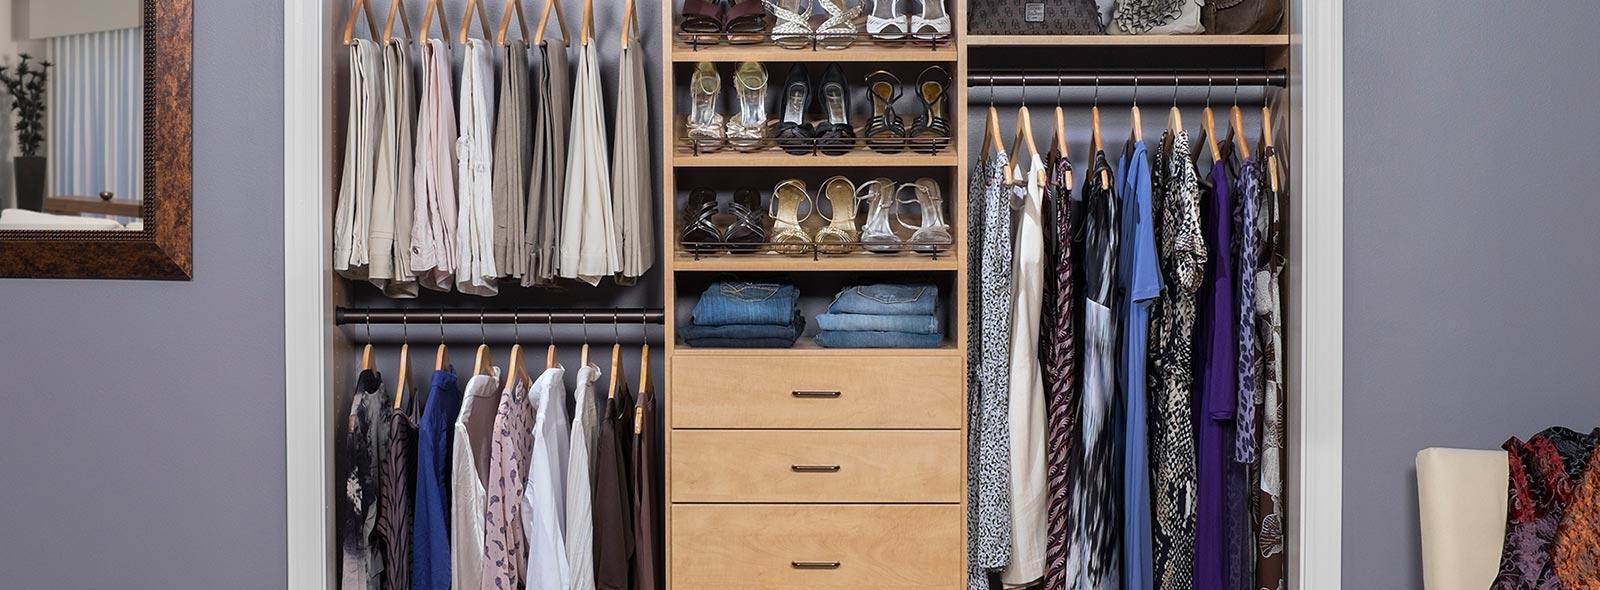 Small closet